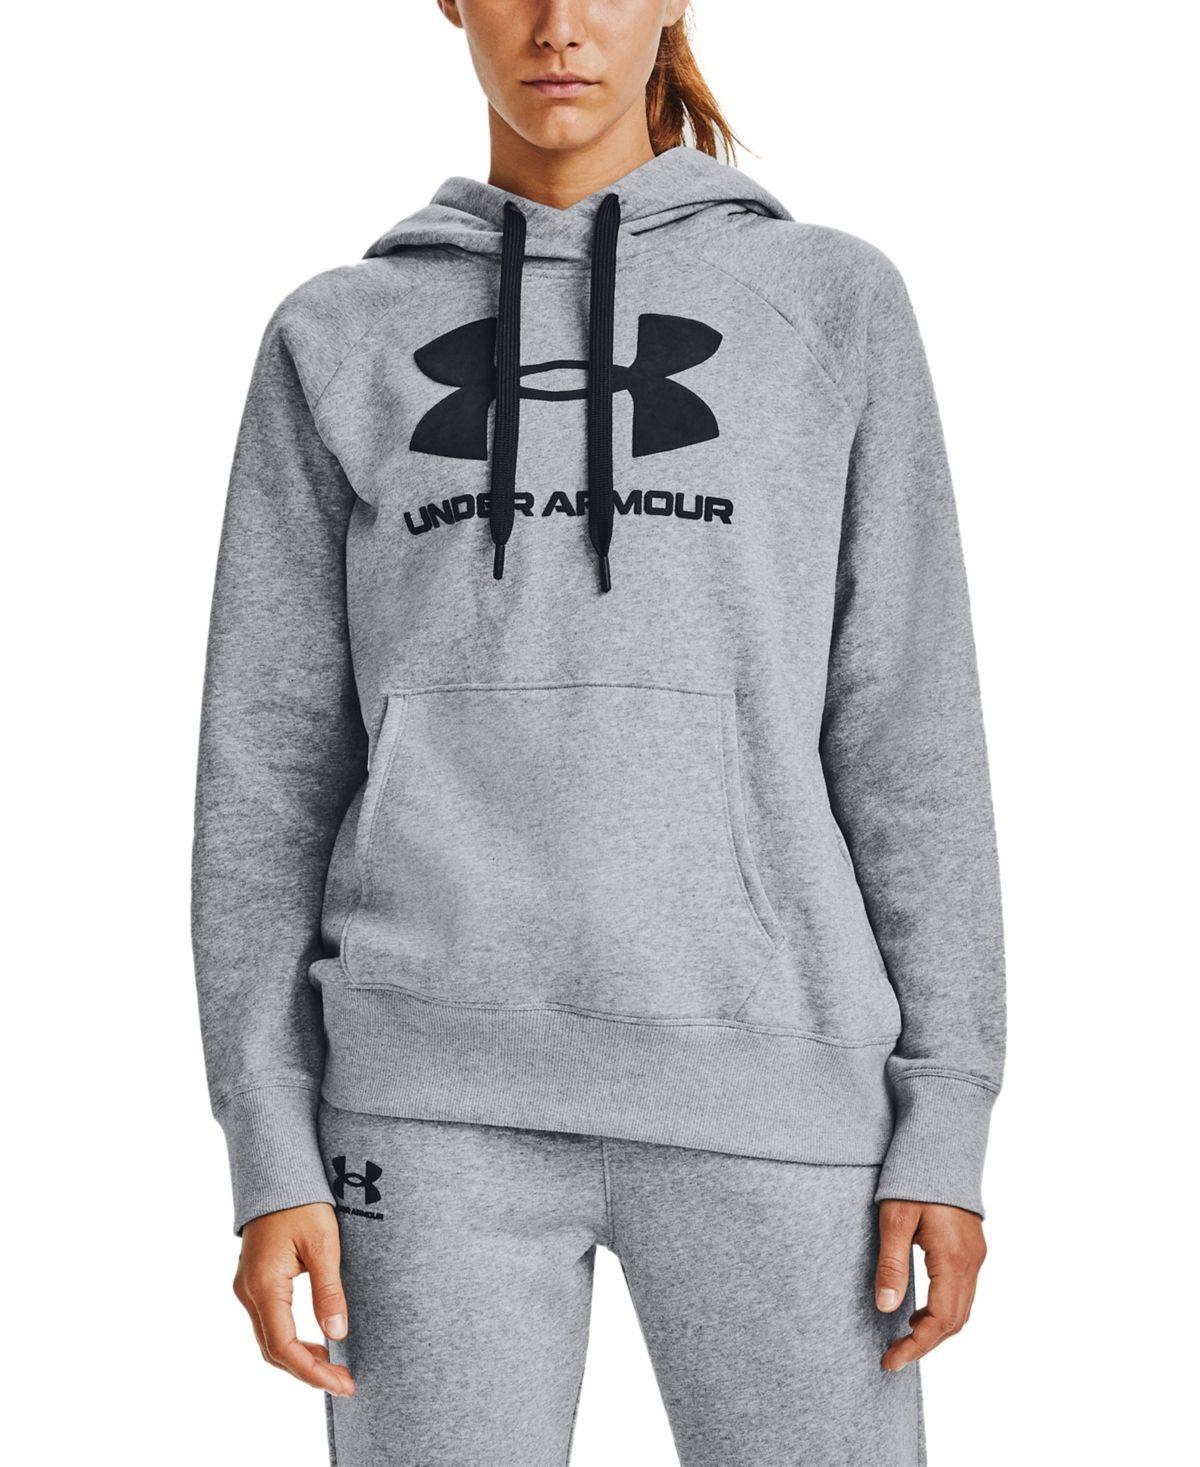 Under Armour Women S Rival Fleece Logo Hoodie Reviews Tops Women Macy S In 2021 Under Armour Outfits Under Armour Women Under Armour Sweatshirts [ 1467 x 1200 Pixel ]